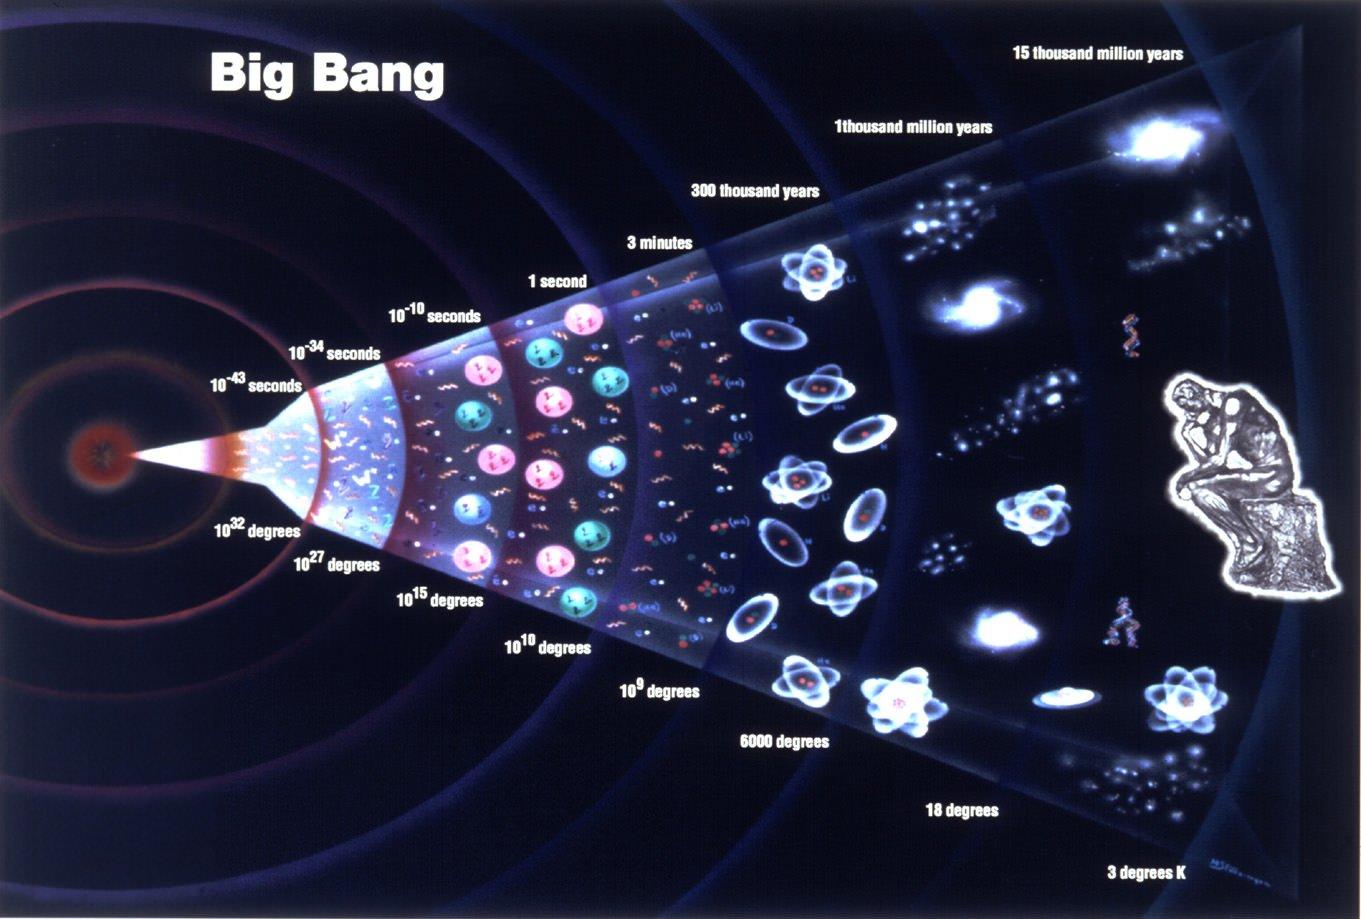 big bang theory에 대한 이미지 검색결과